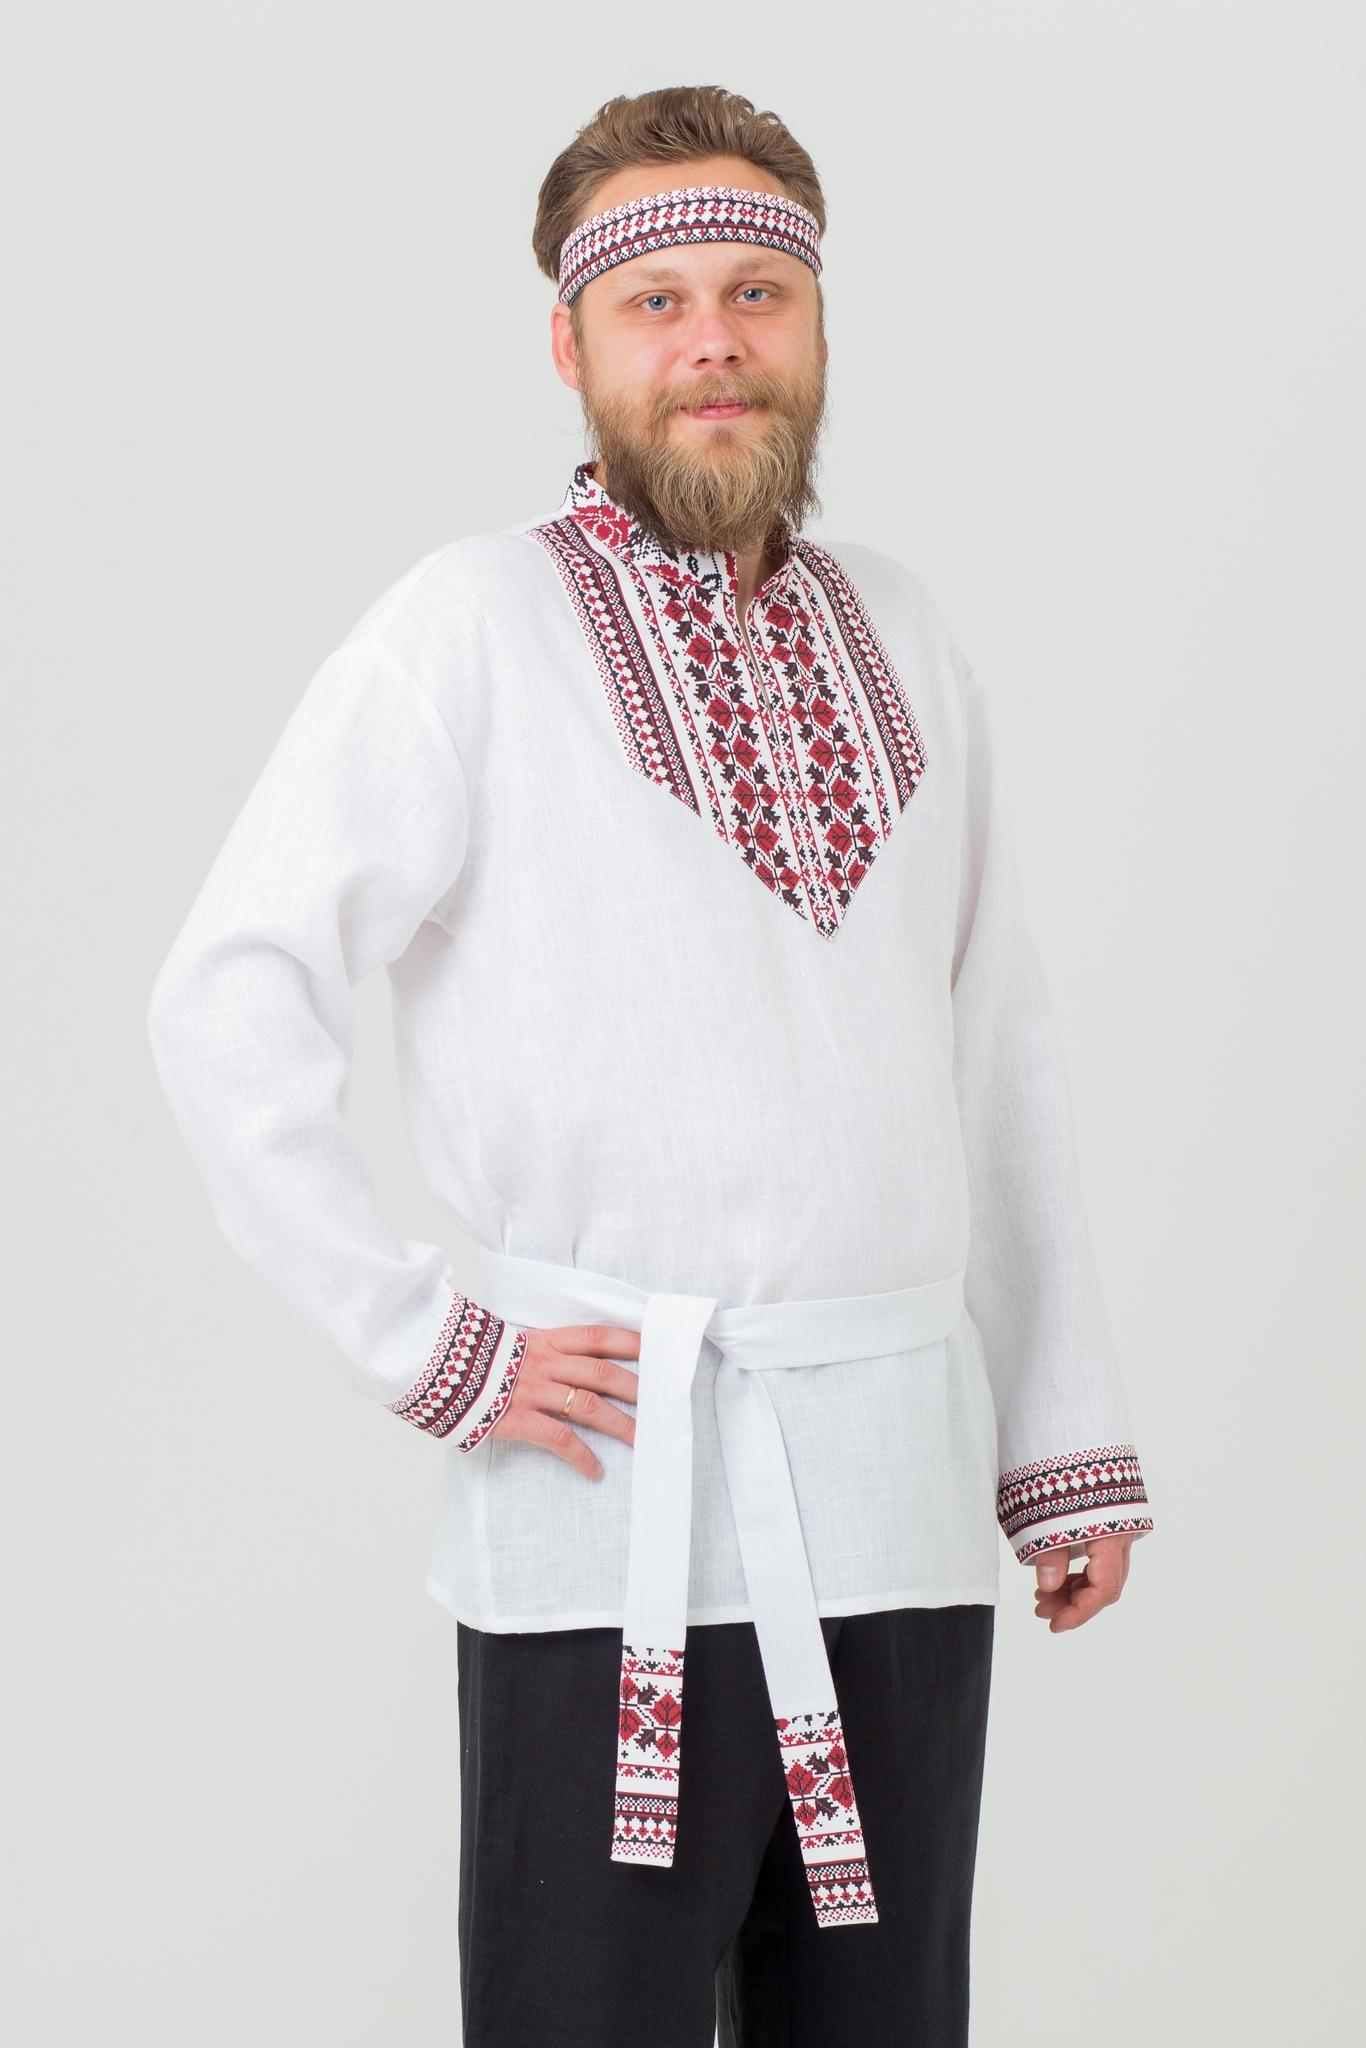 Рубаха мужская льняная Мужская сила купить